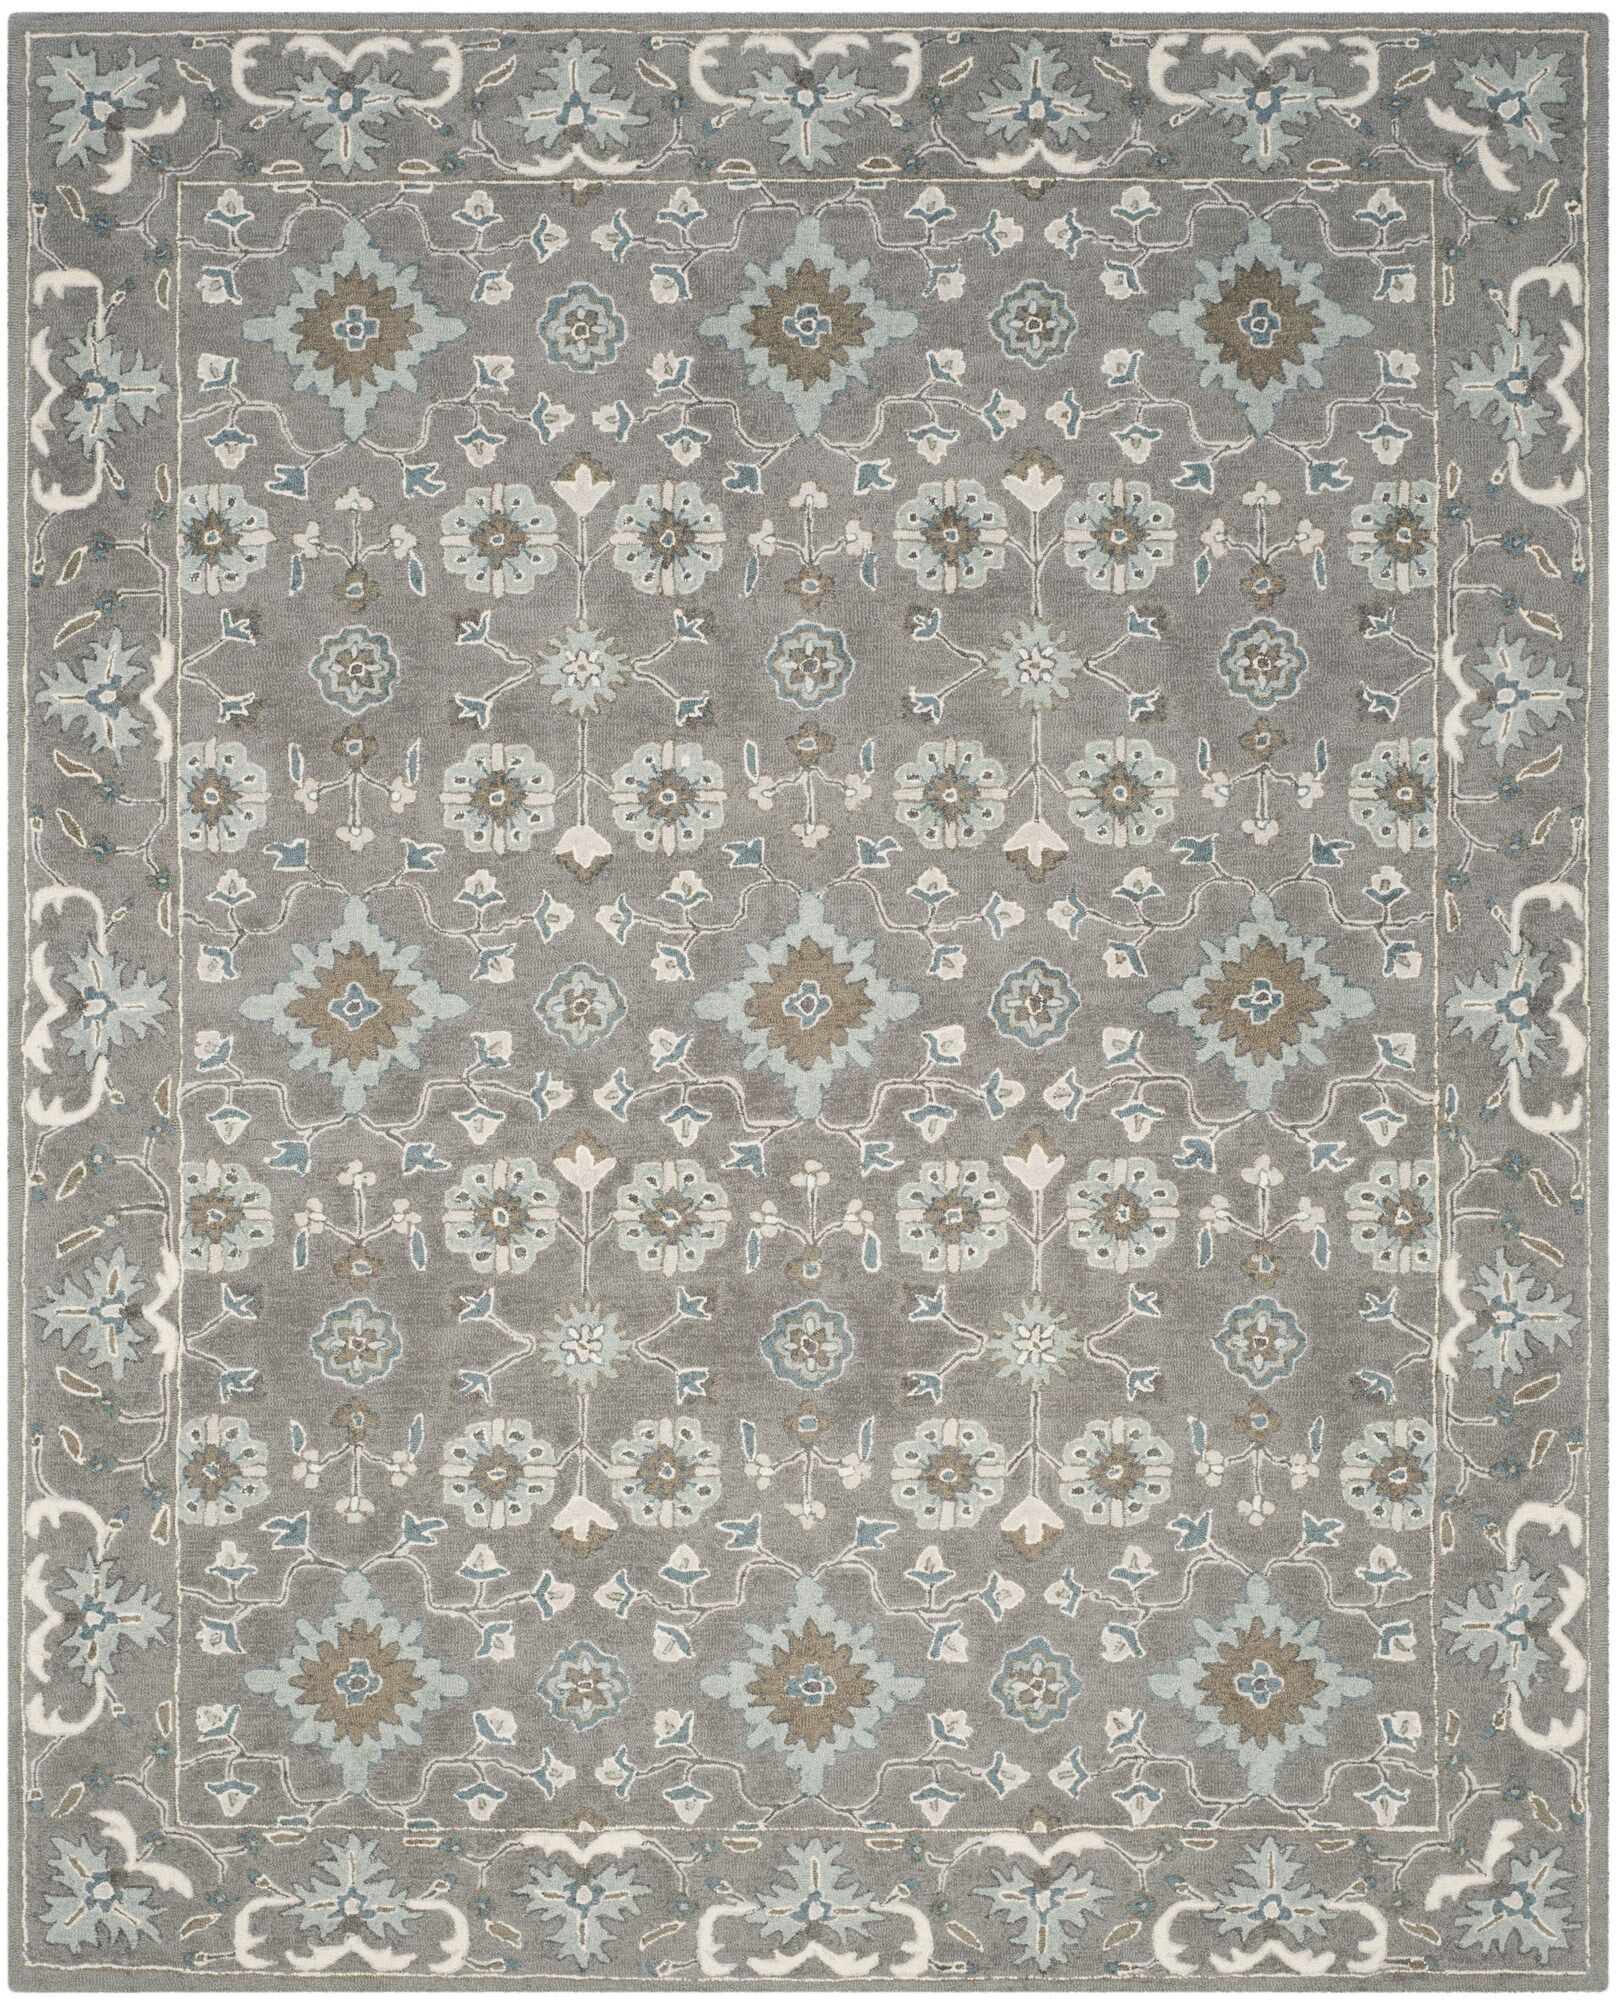 Kilbourne Hand-Tufted Gray Area Rug Rug Size: Rectangle 8'9